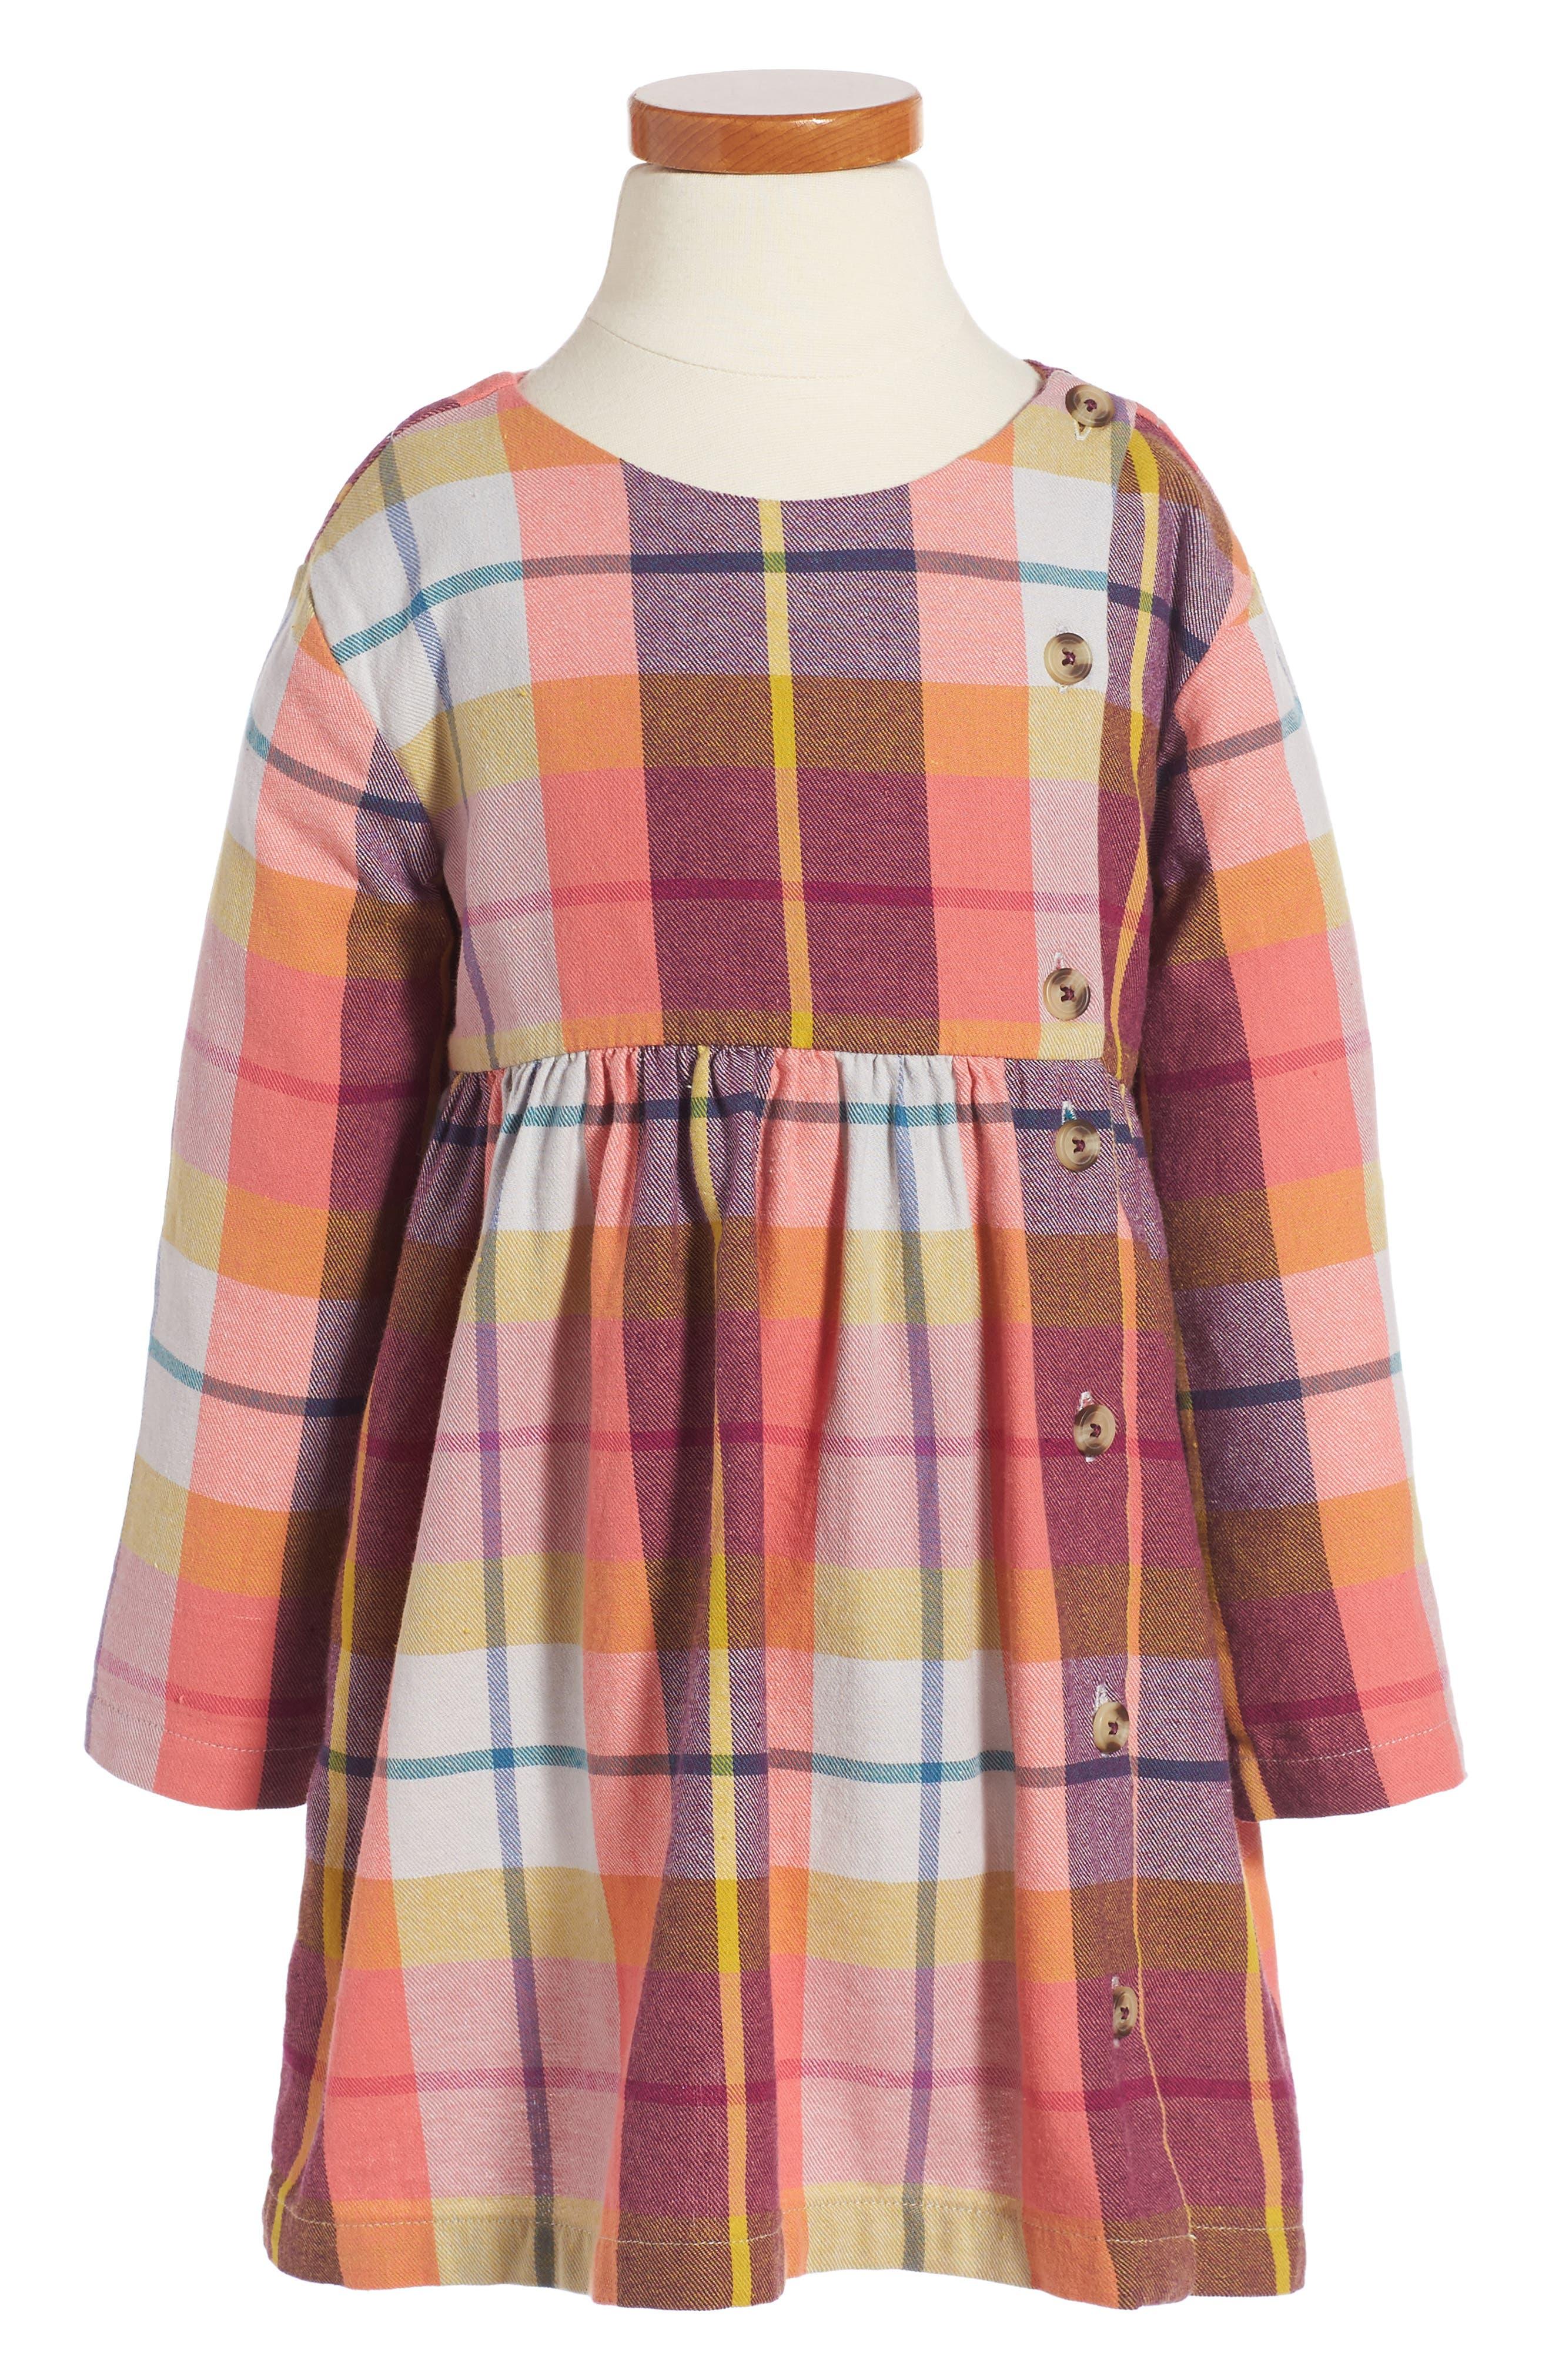 Main Image - Tea Collection Plaid Flannel Dress (Toddler Girls & Little Girls)